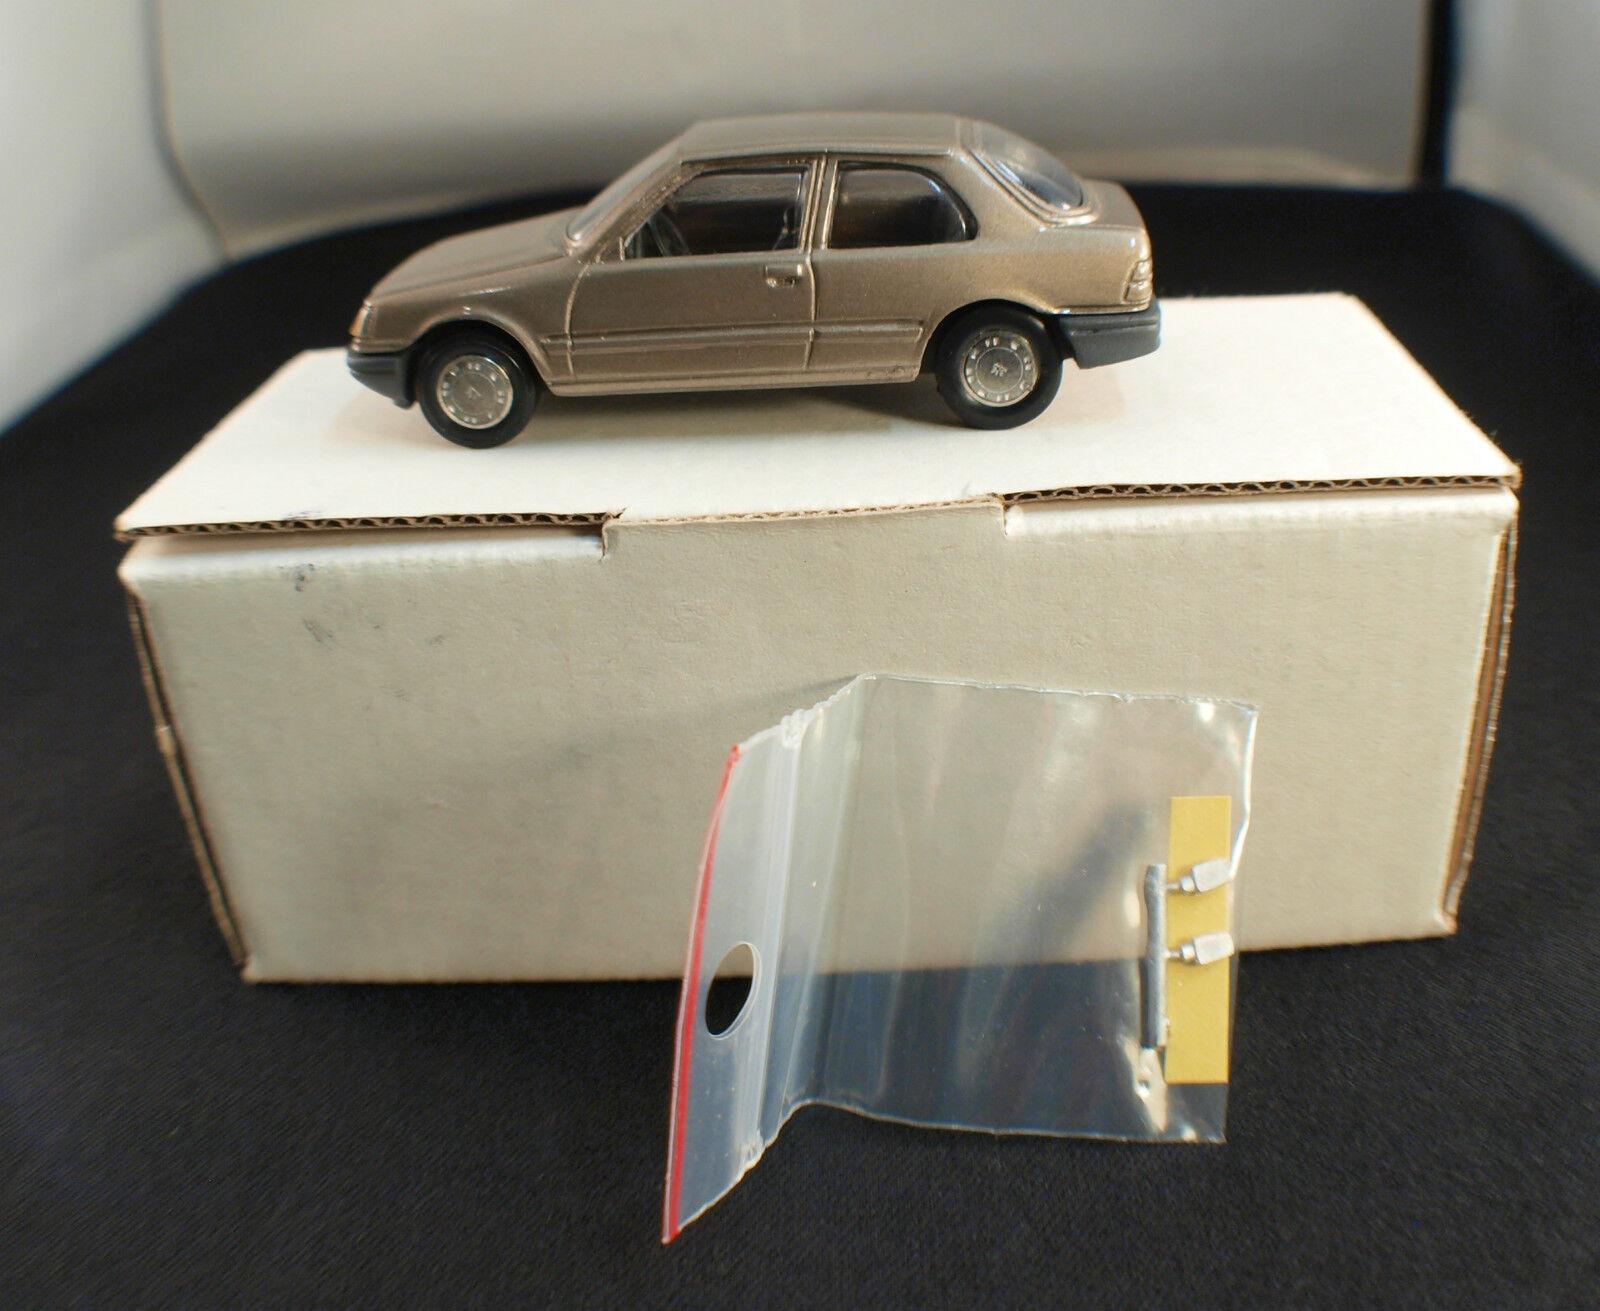 M. V.I ◊ m.034 Peugeot 309 3 Portes Xe XR ◊ 1 43 ◊ in Schachtel   Boxed ◊ Selten